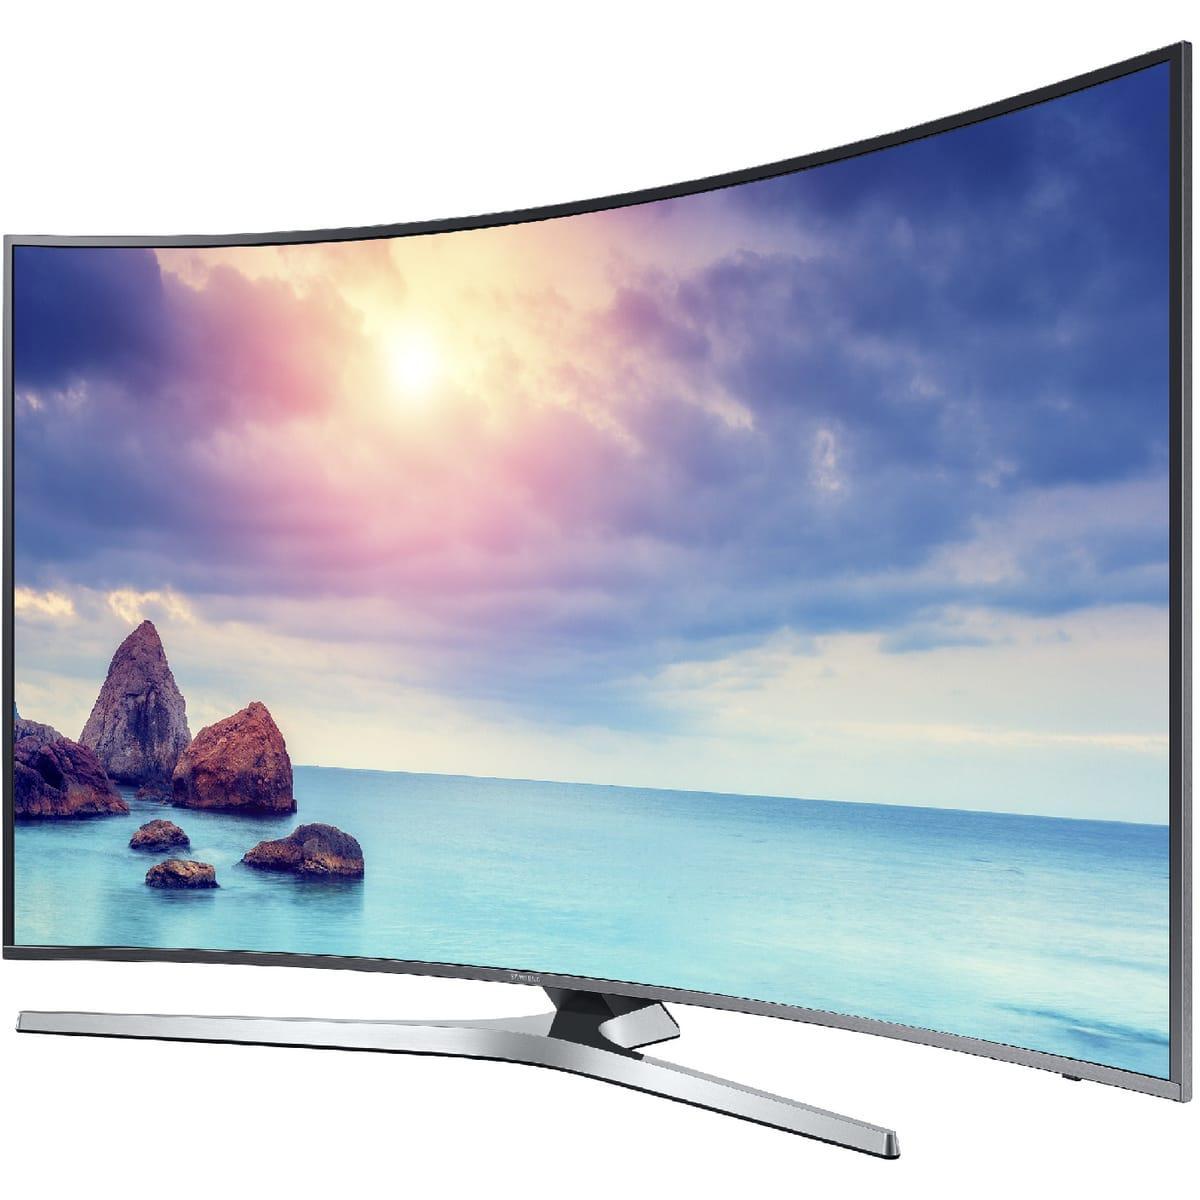 "sélection de tv samsung en promotion - ex : tv 55"" ue55ku6650 - led"